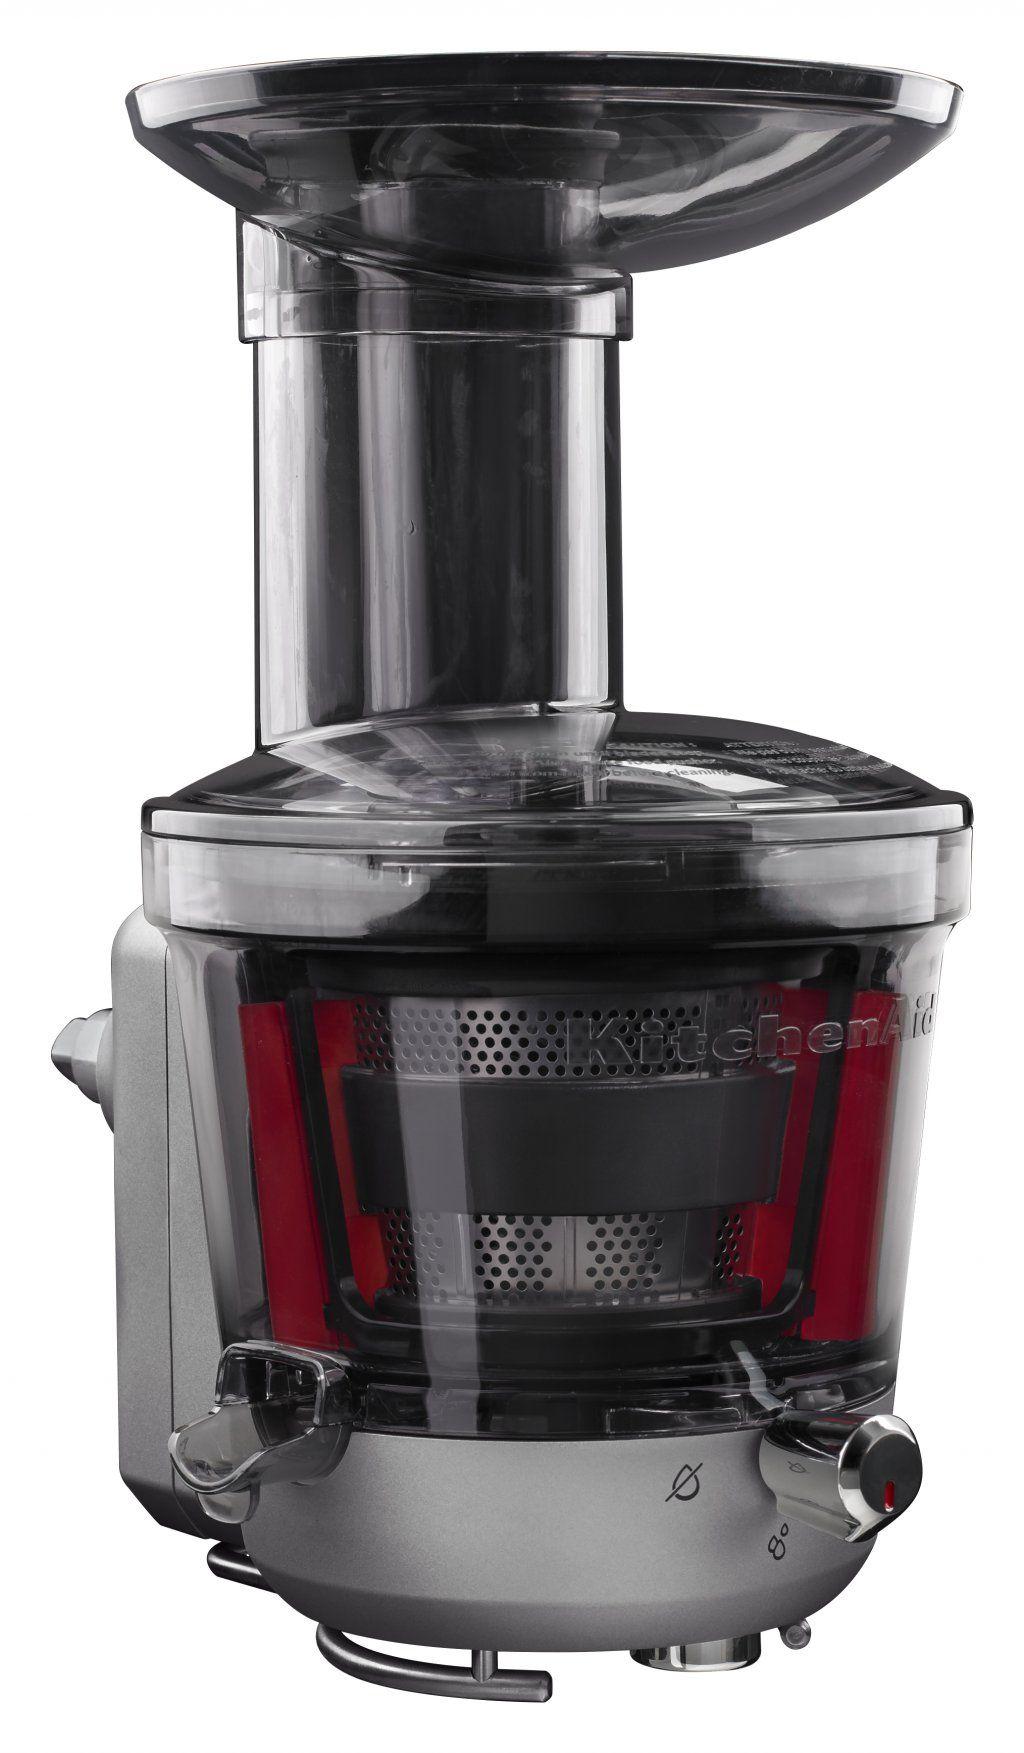 Juicer sauce attachment kitchenaid kitchen aid